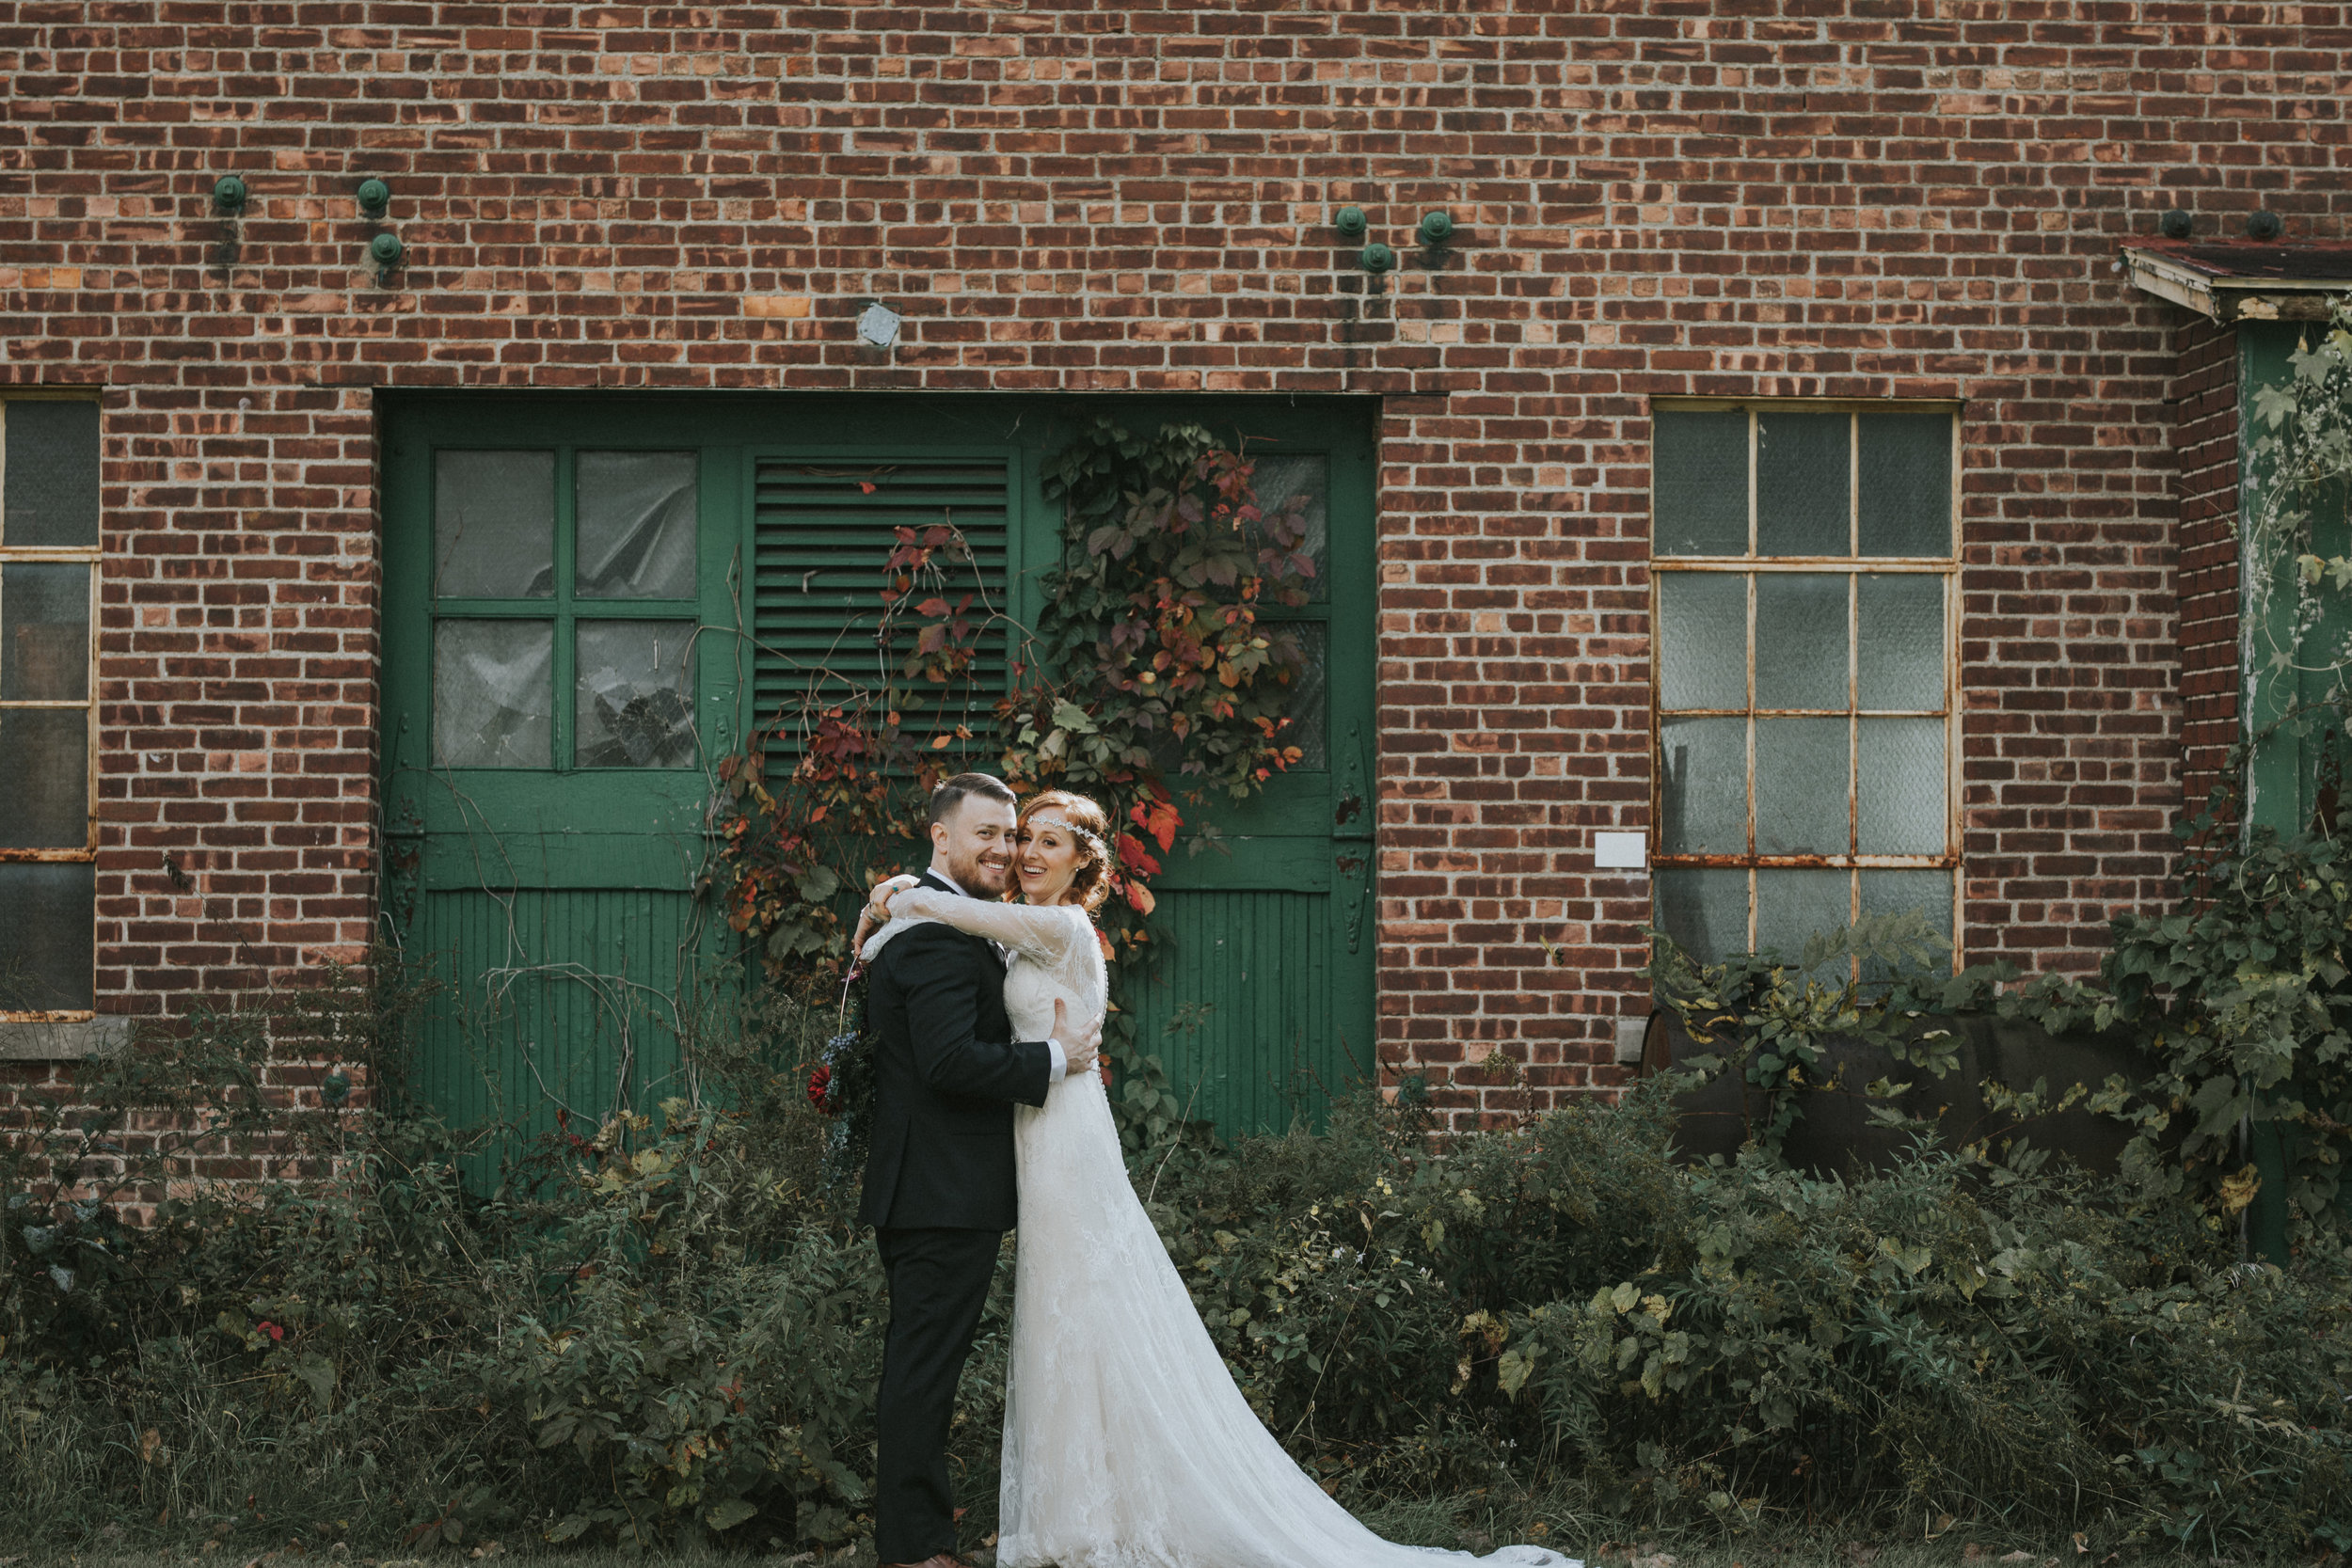 shaker_heritage_barn_wedding_016.jpg